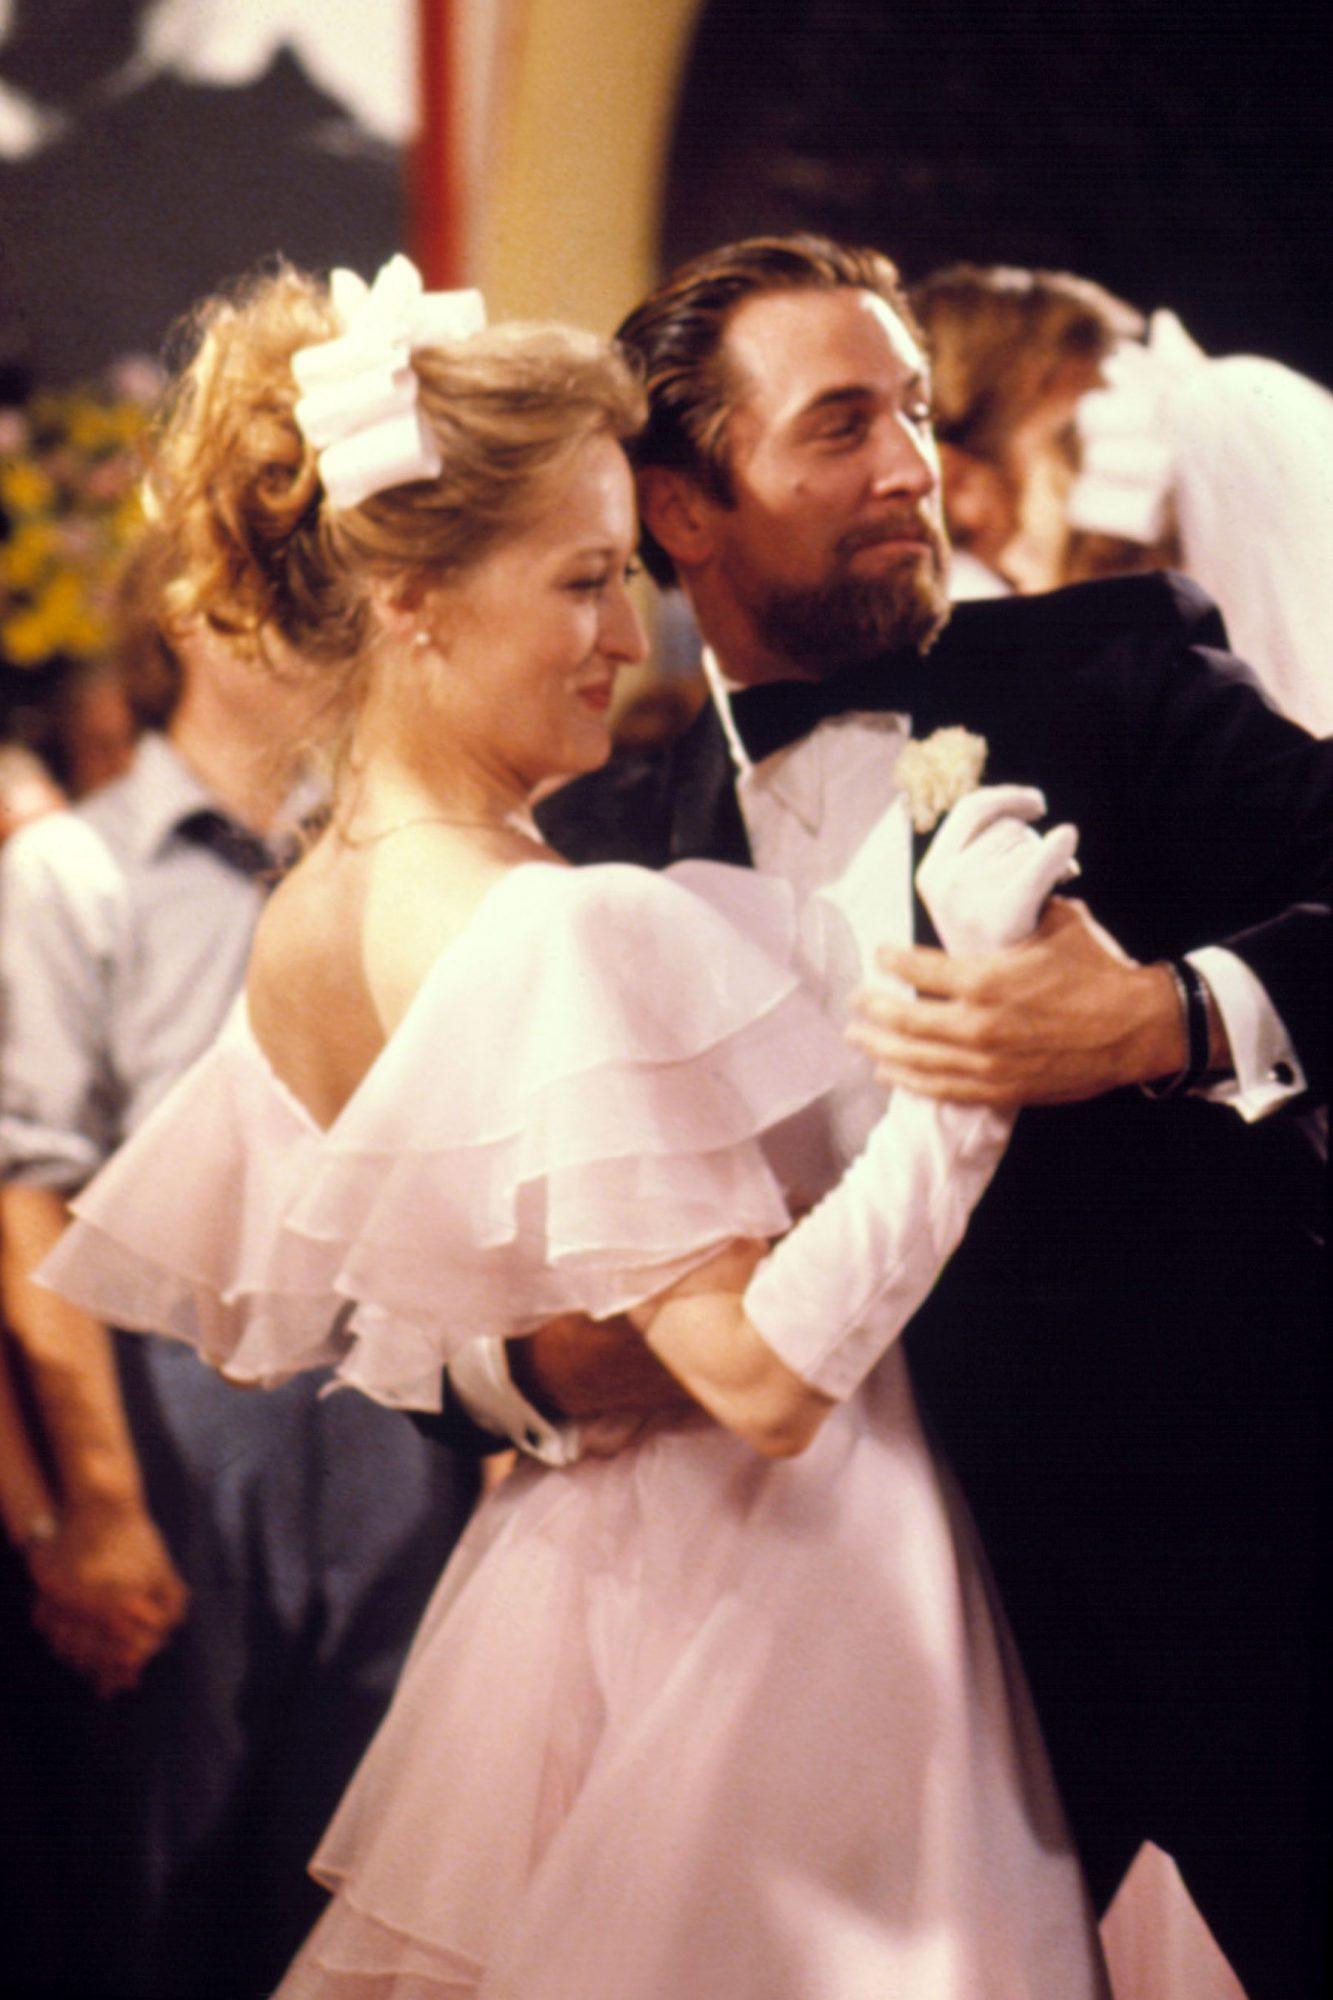 THE DEER HUNTER, Meryl Streep, Robert De Niro, 1978, (c) Universal/courtesy Everett Collection